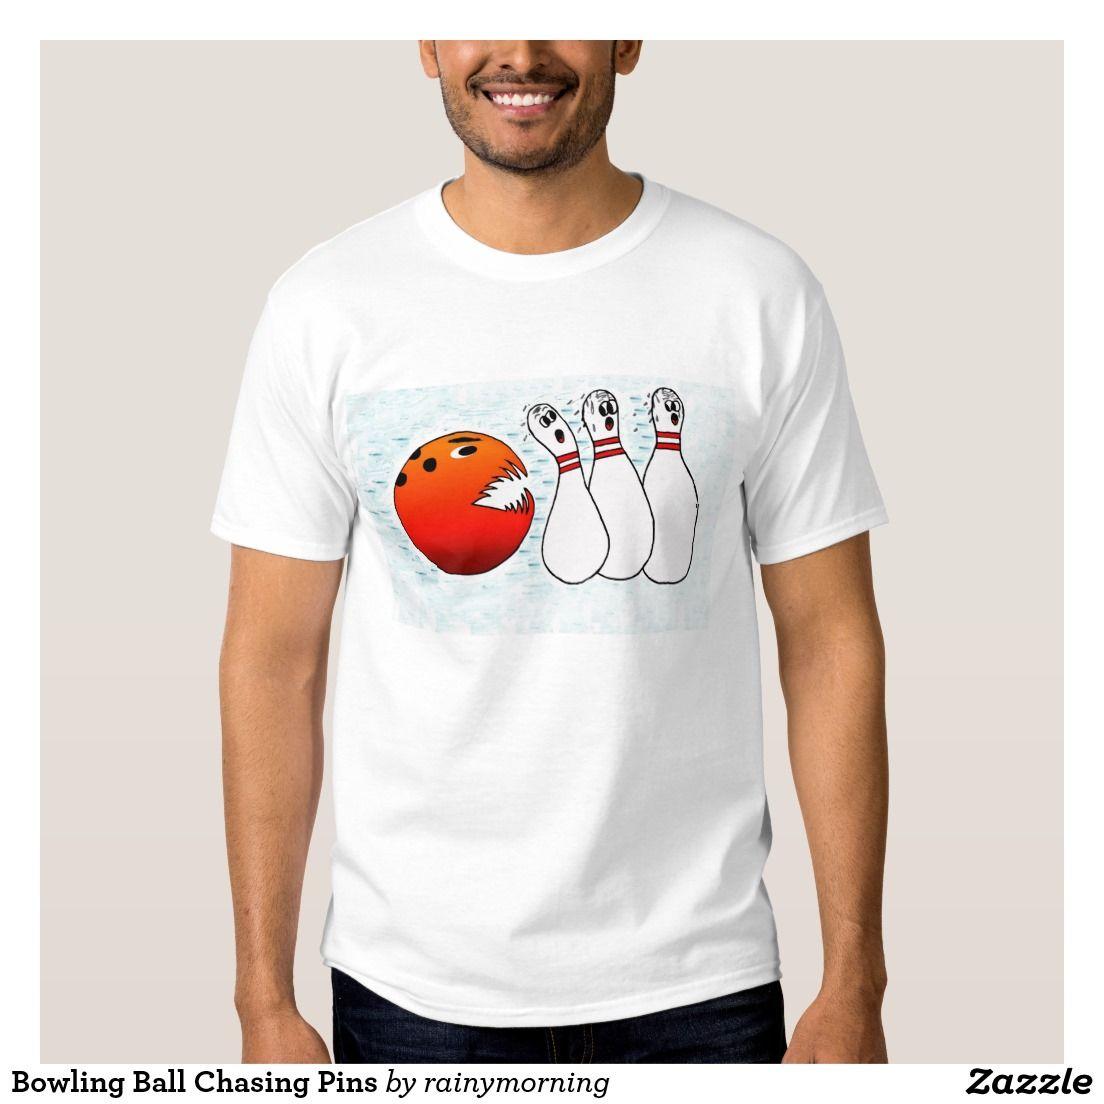 Zazzle t shirt design size - Bowling Ball Chasing Pins T Shirt